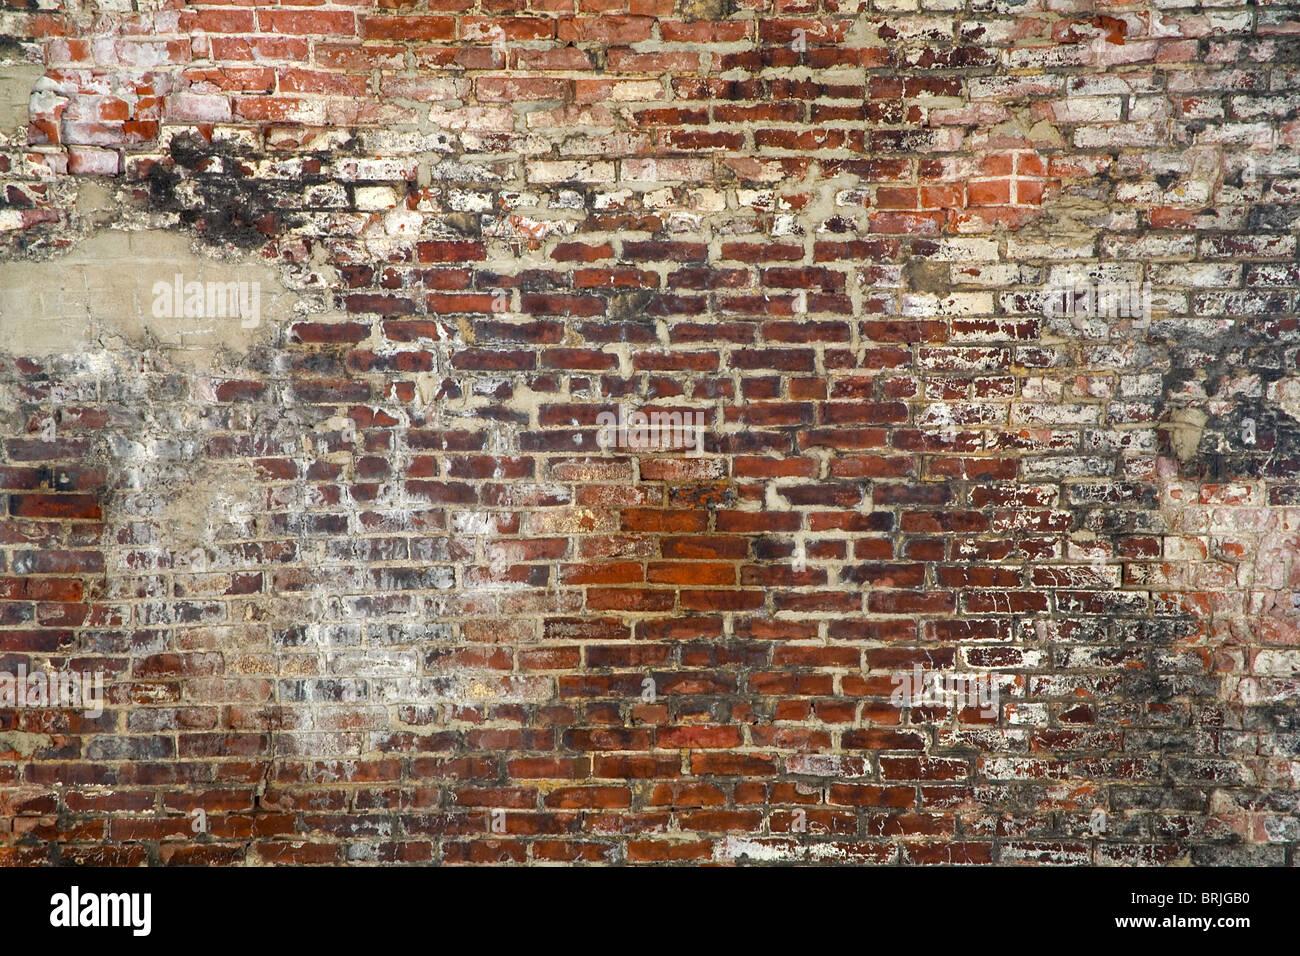 Ziegelmauer Stockbild